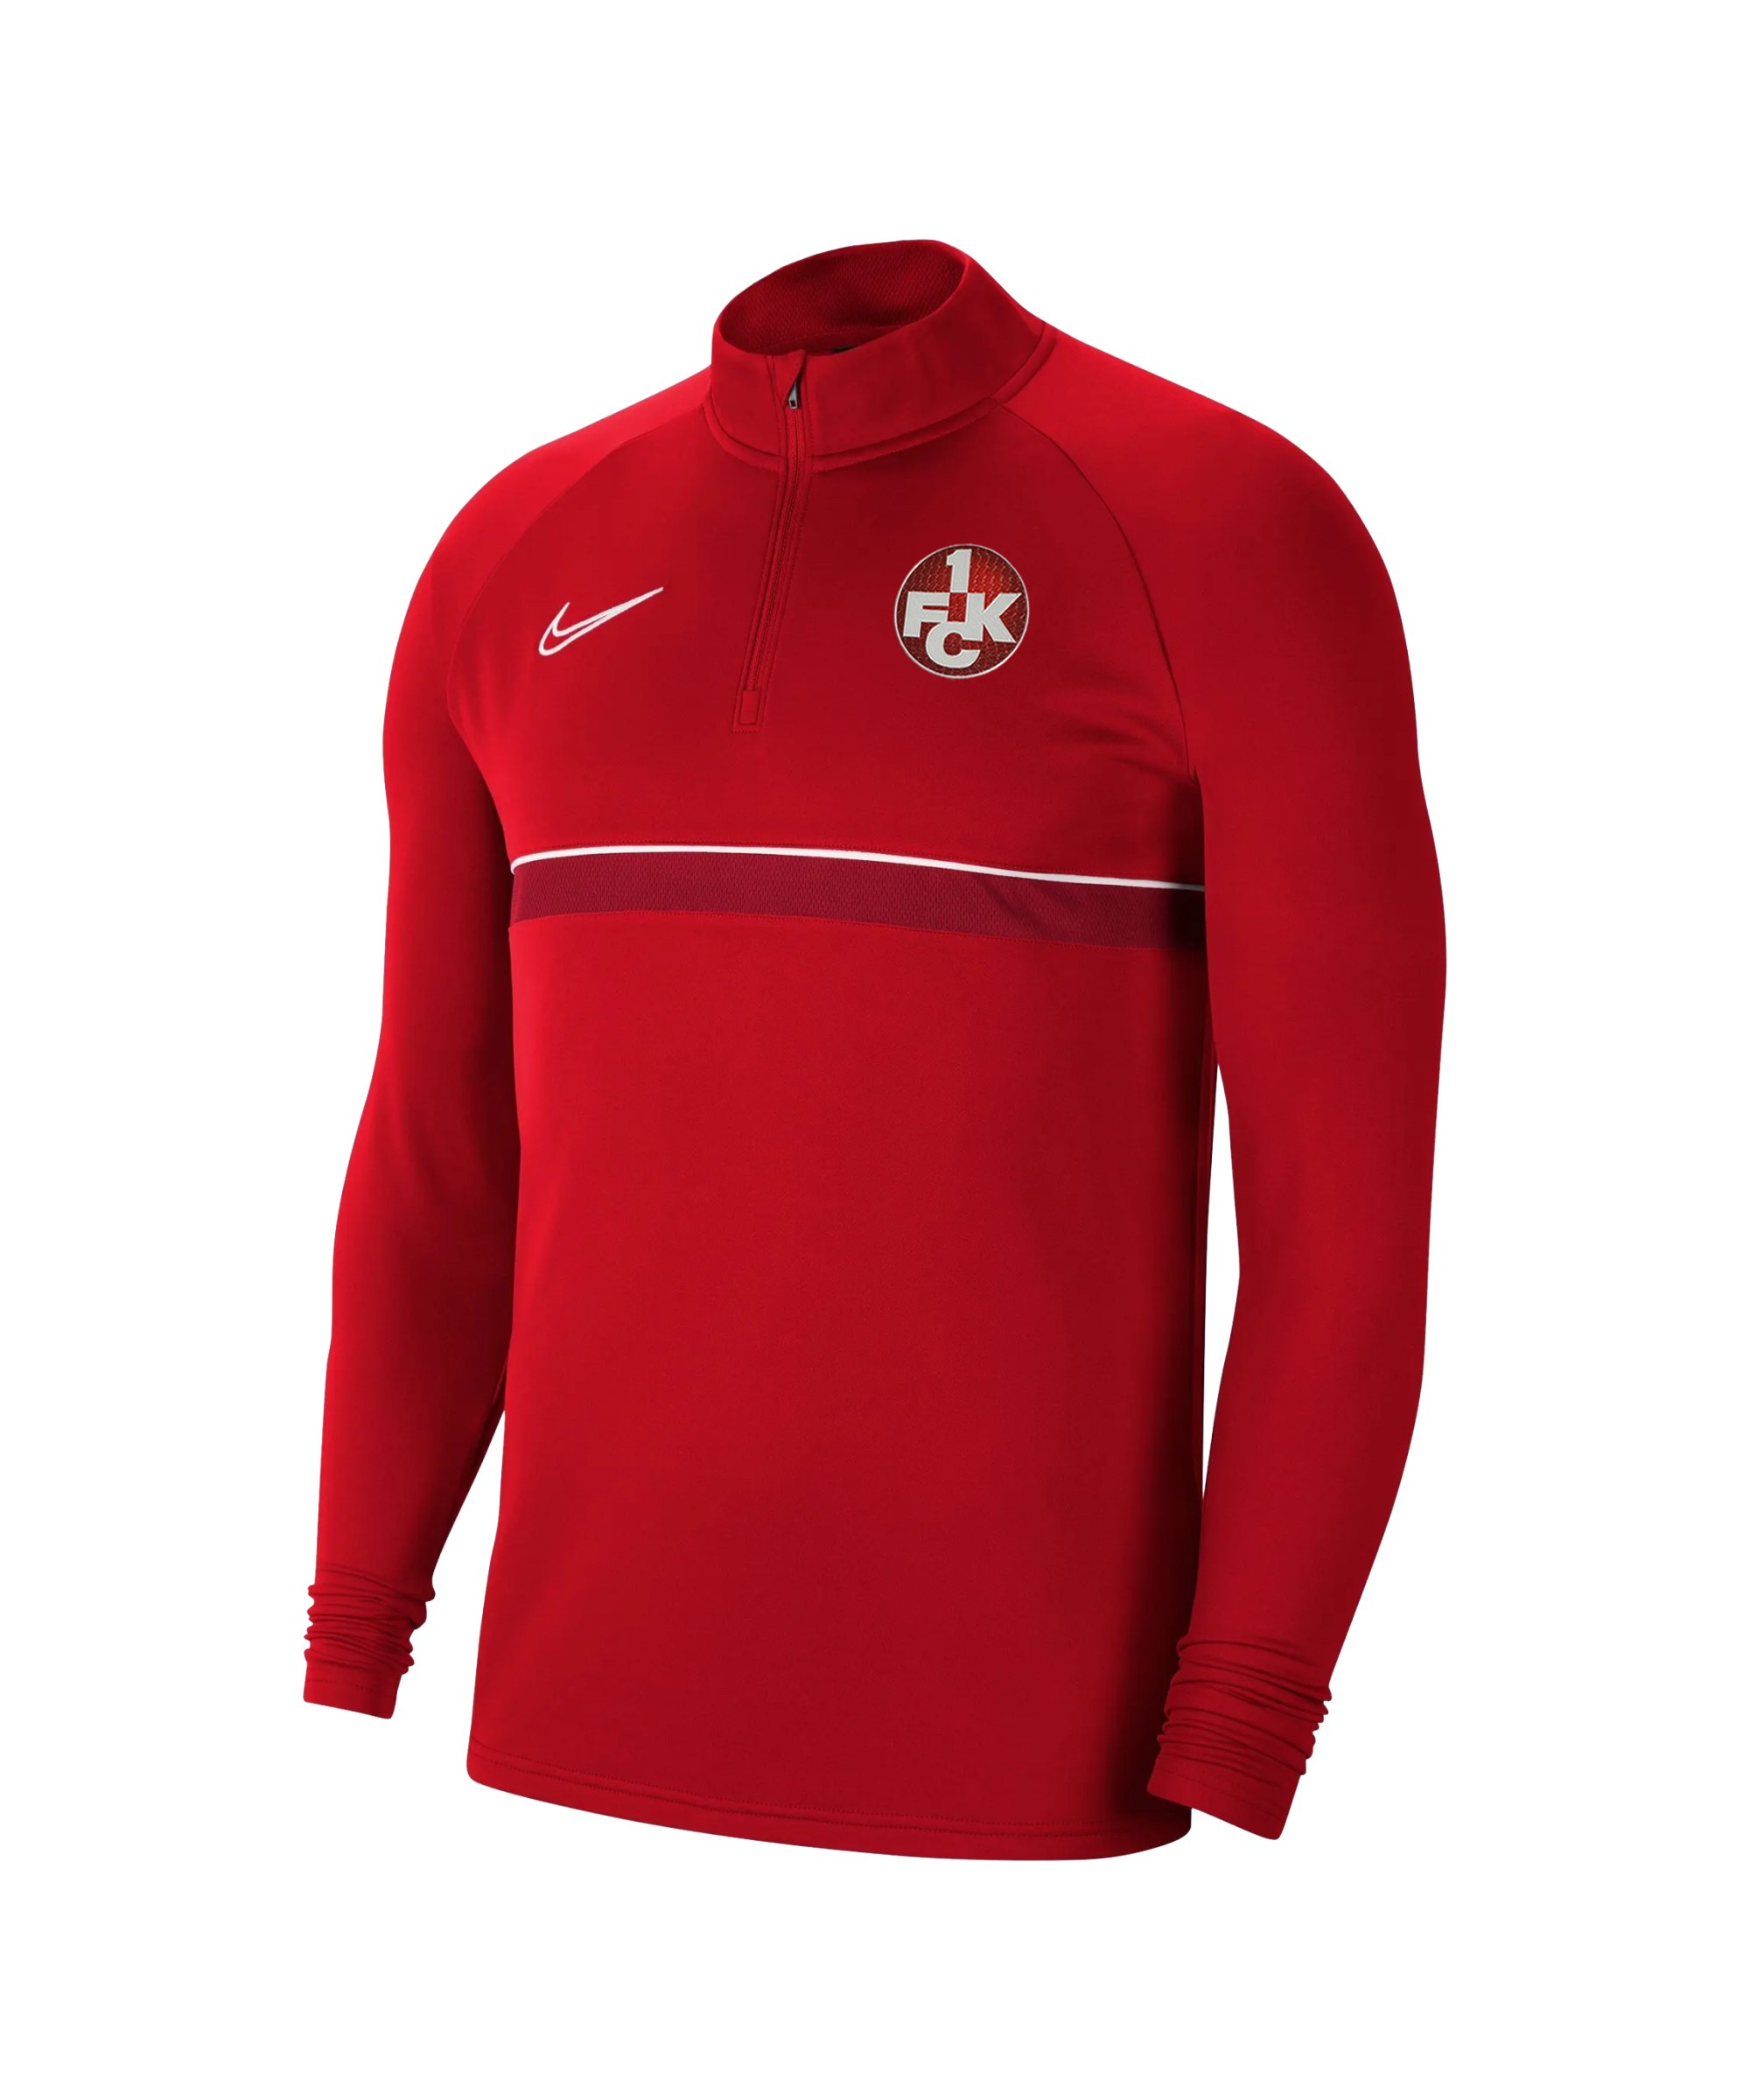 Nike 1. FC Kaiserslautern Drill Top Sweatshirt F657 - rot